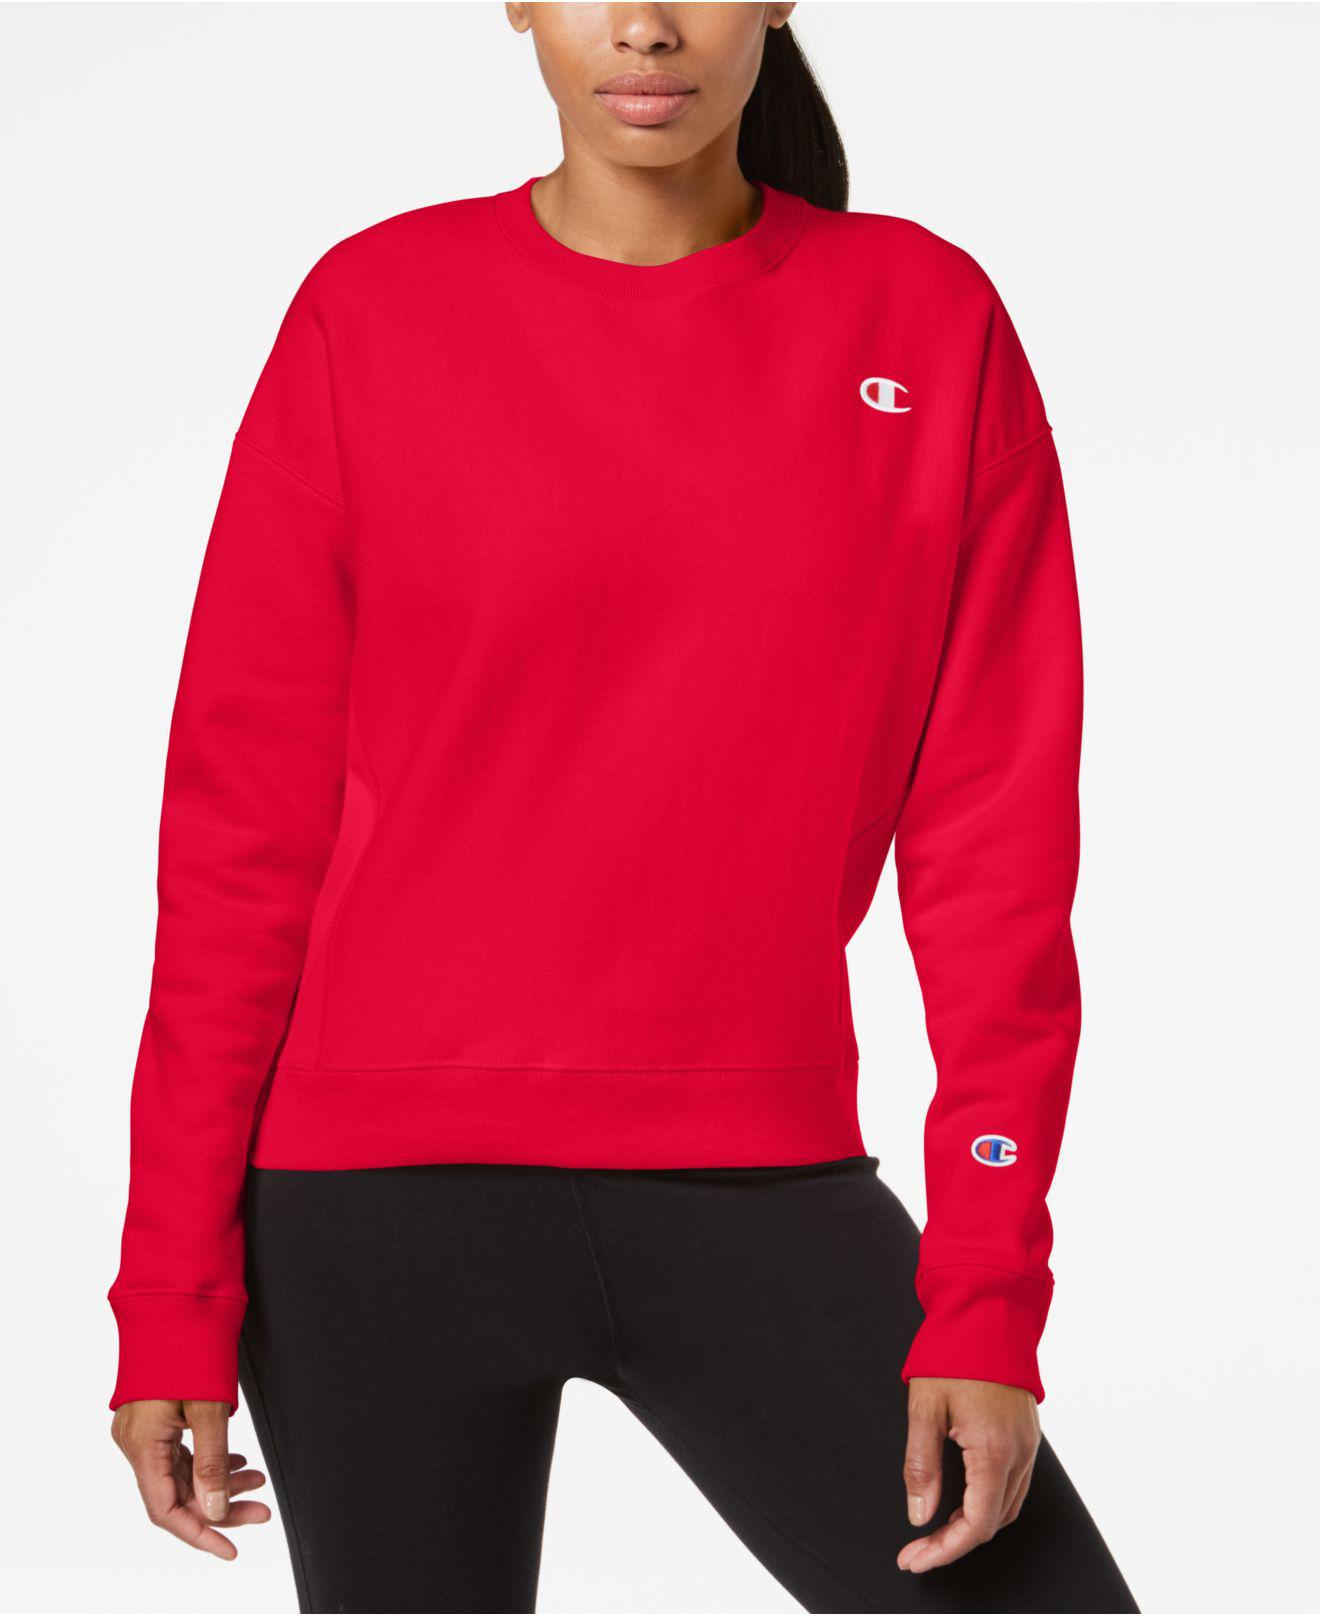 410cc1590bda Lyst - Champion Essential Reverse Weave Fleece Sweatshirt in Red